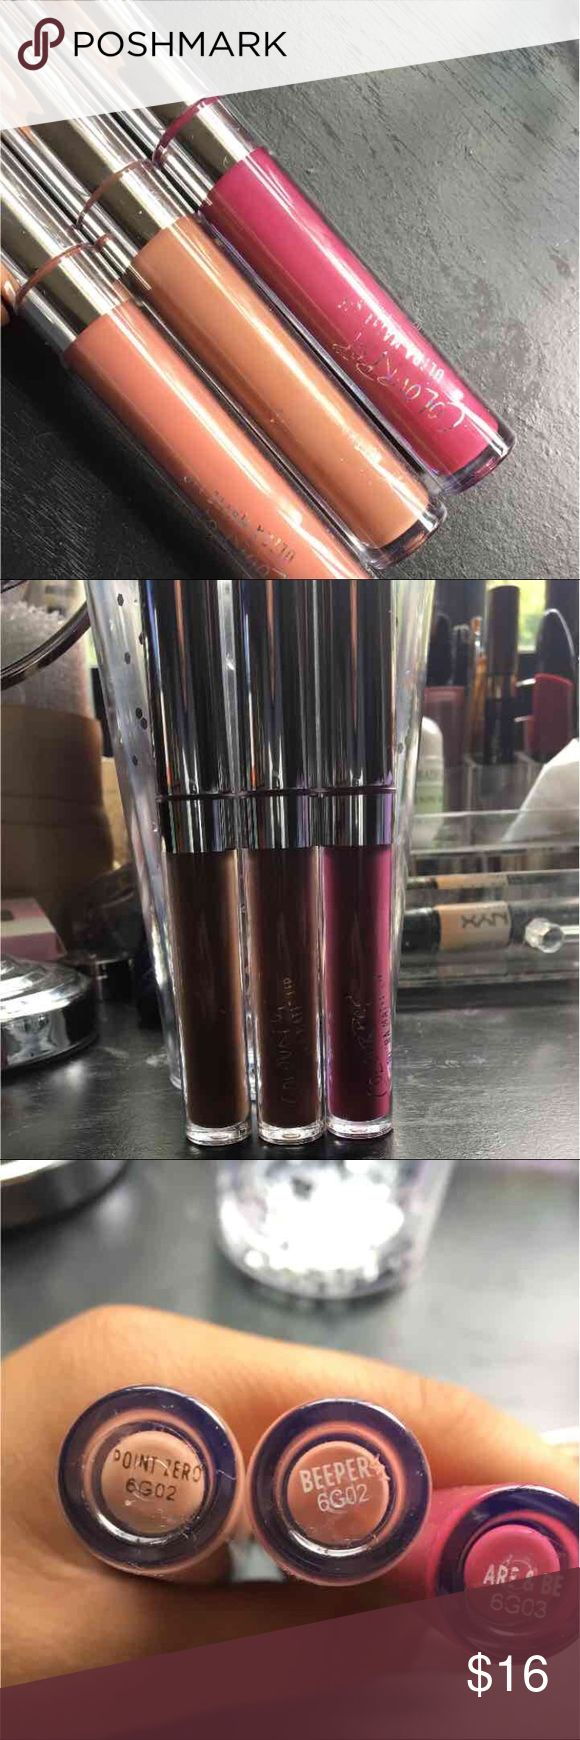 3 colourpop cosmetics lipsticks Shades-beeper, ARE&BE, point zero Colourpop Makeup Lipstick